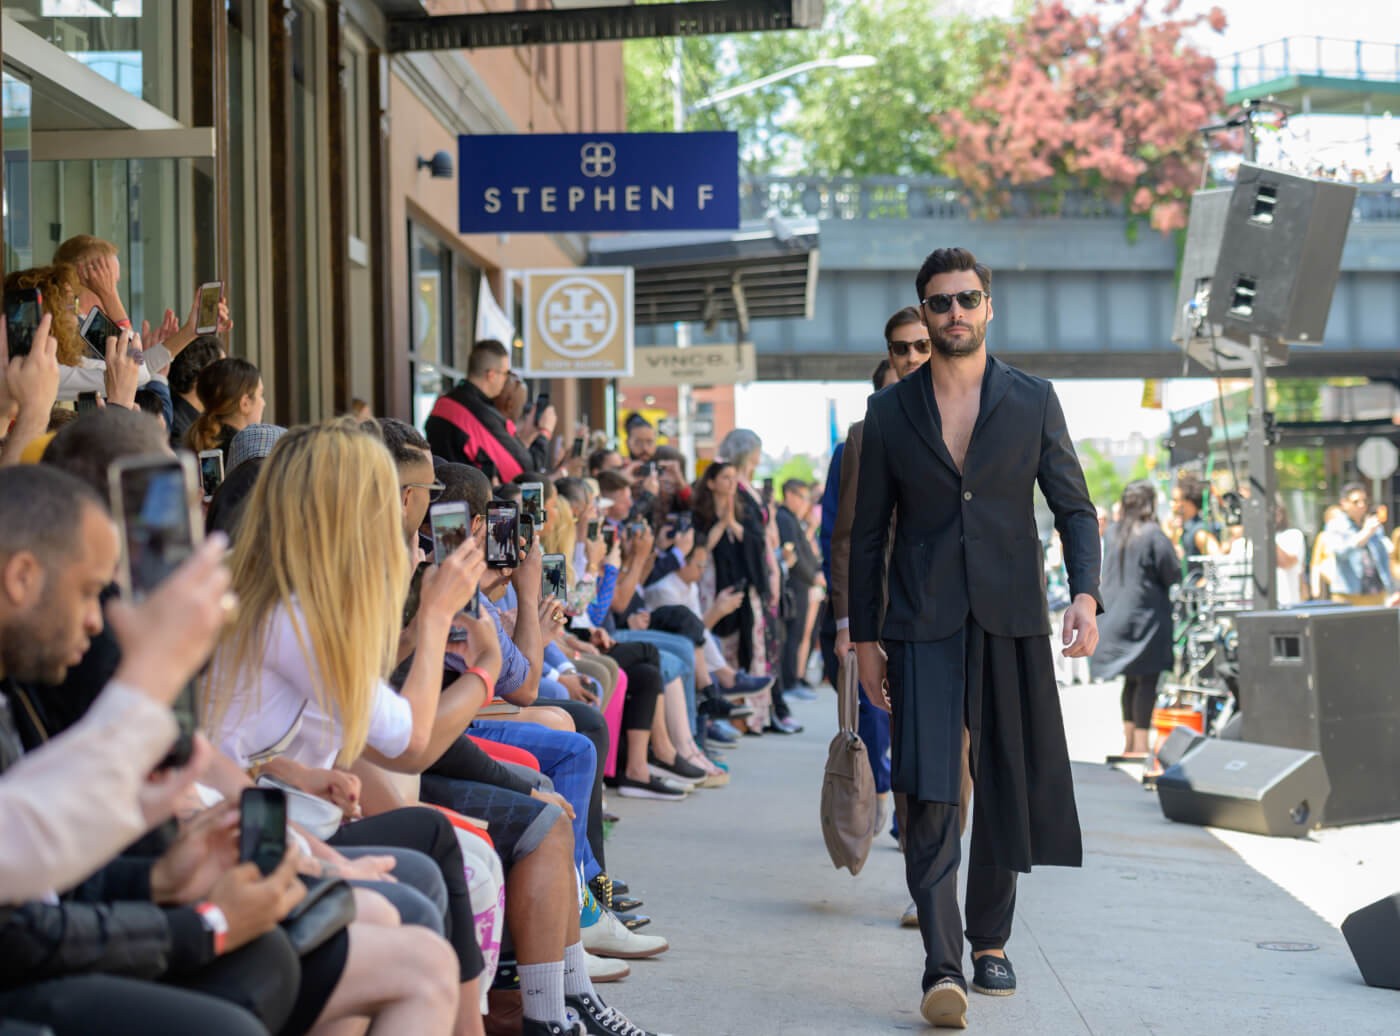 Peta Stephen F S Vegan Suits Are Ruling Fashion Week Peta